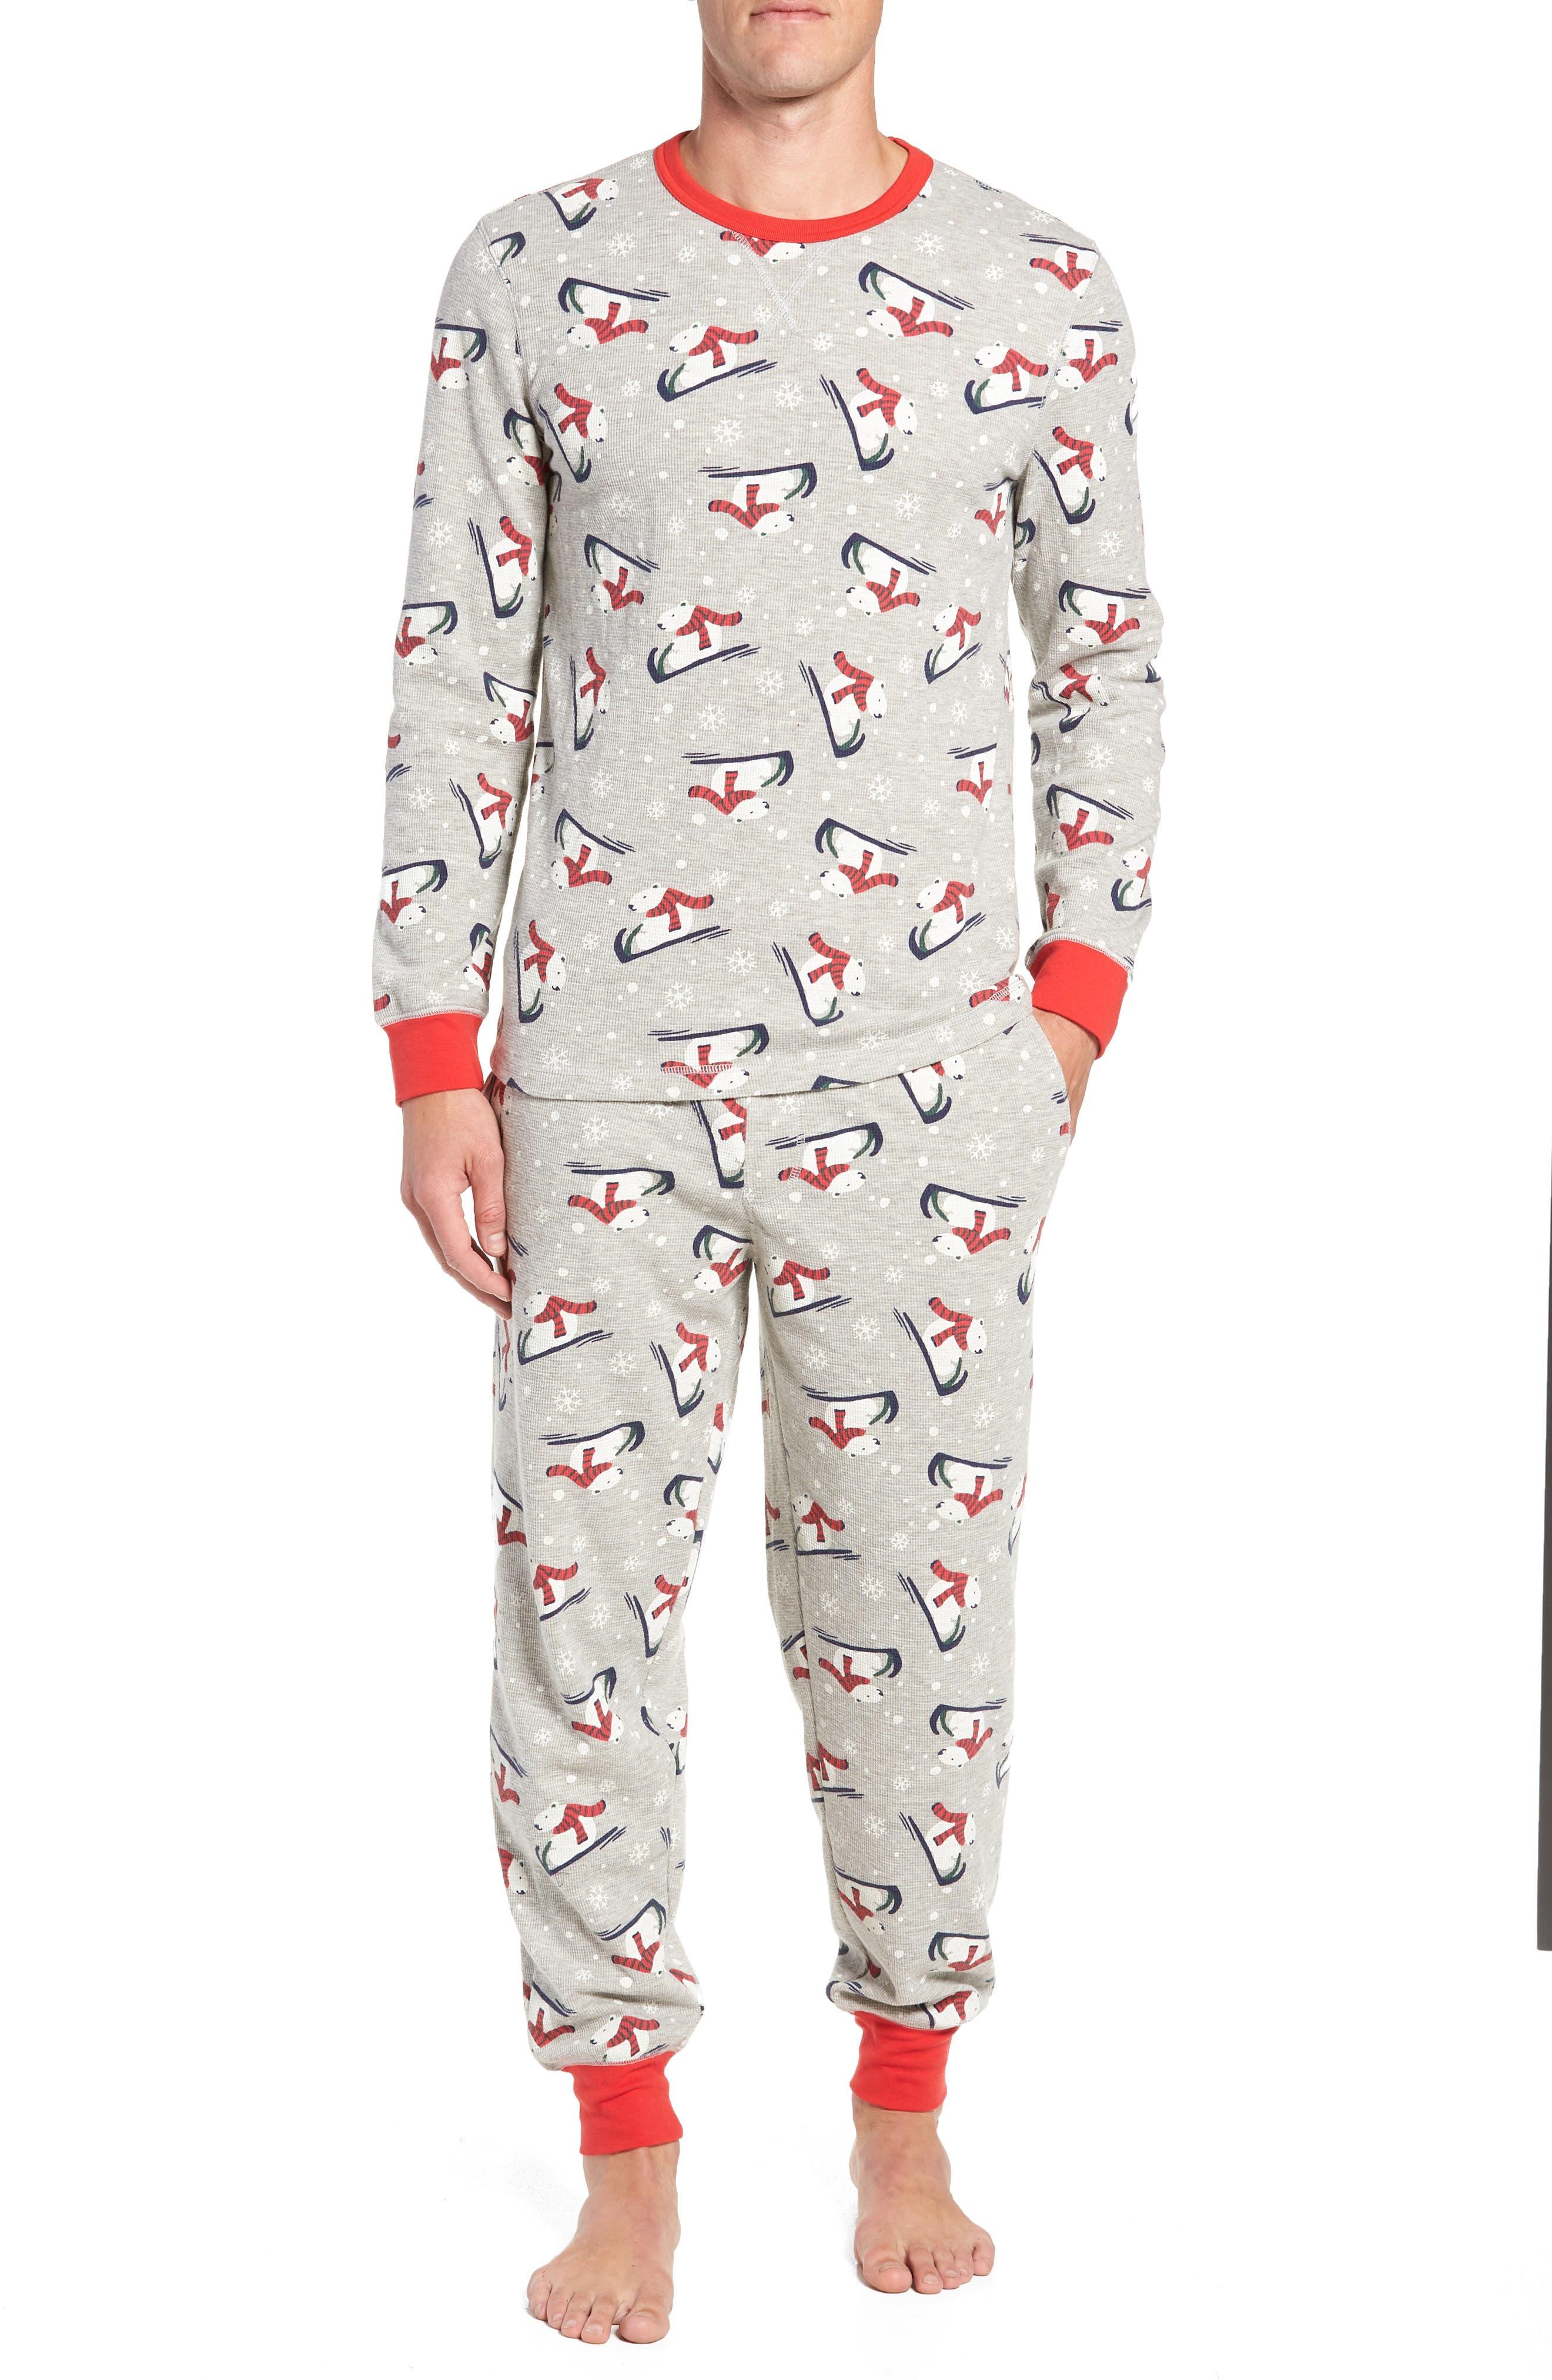 Family Father Thermal Pajamas,                             Main thumbnail 1, color,                             GREY PEARL HEATHER POLAR BEAR